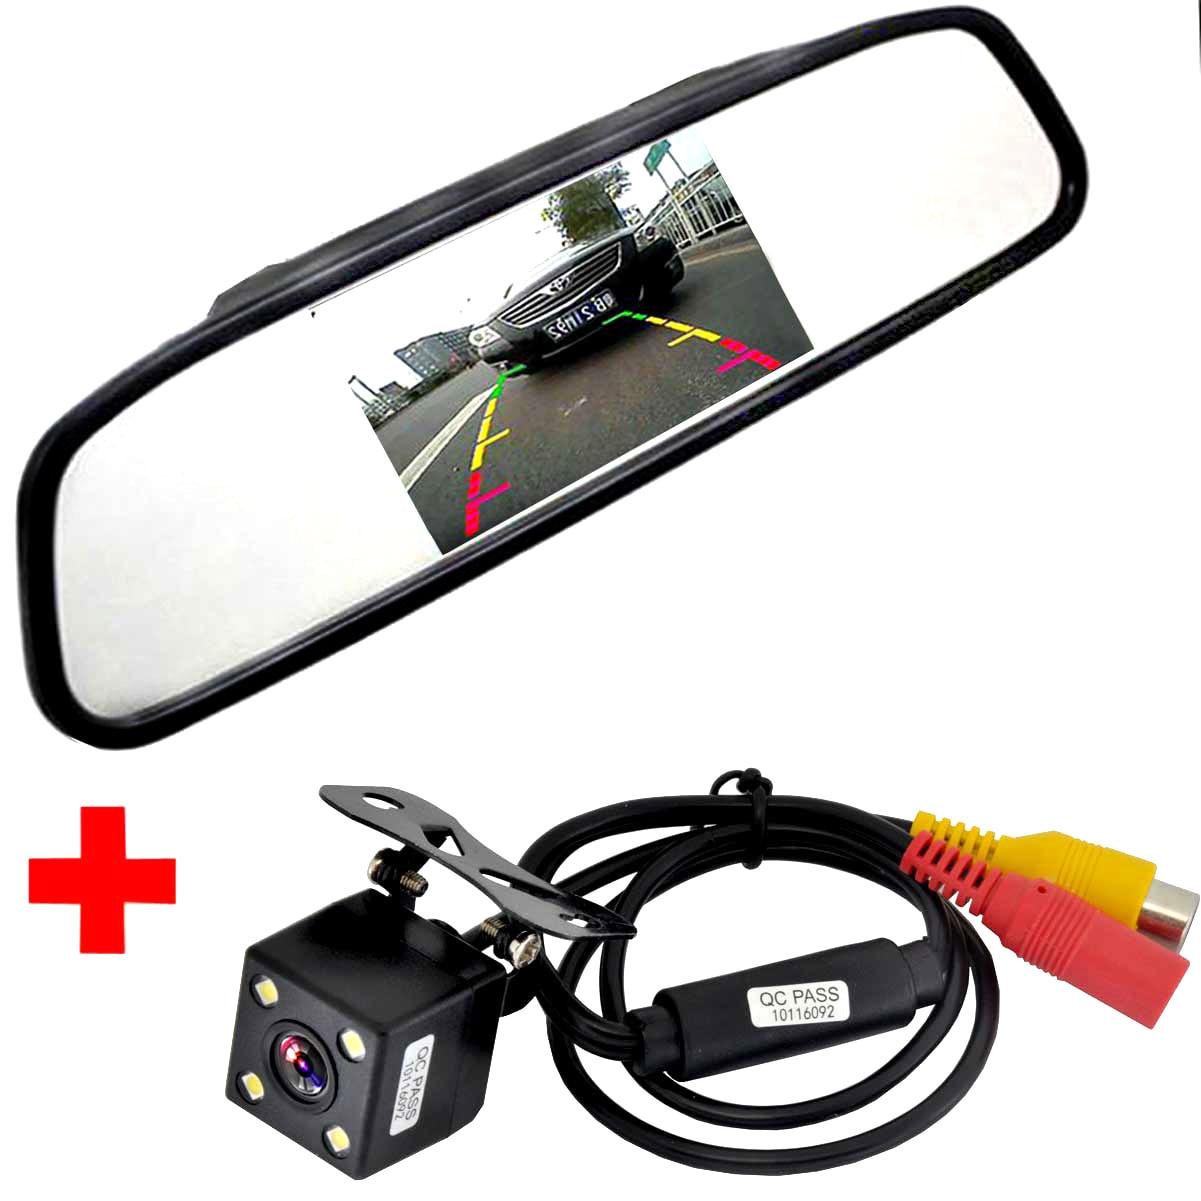 Auto HD Video Auto Parkplatz Monitor, LED Nachtsicht Rückfahr CCD Auto Rückansicht Kamera Mit 4,3 inch Auto Rückspiegel Monitor